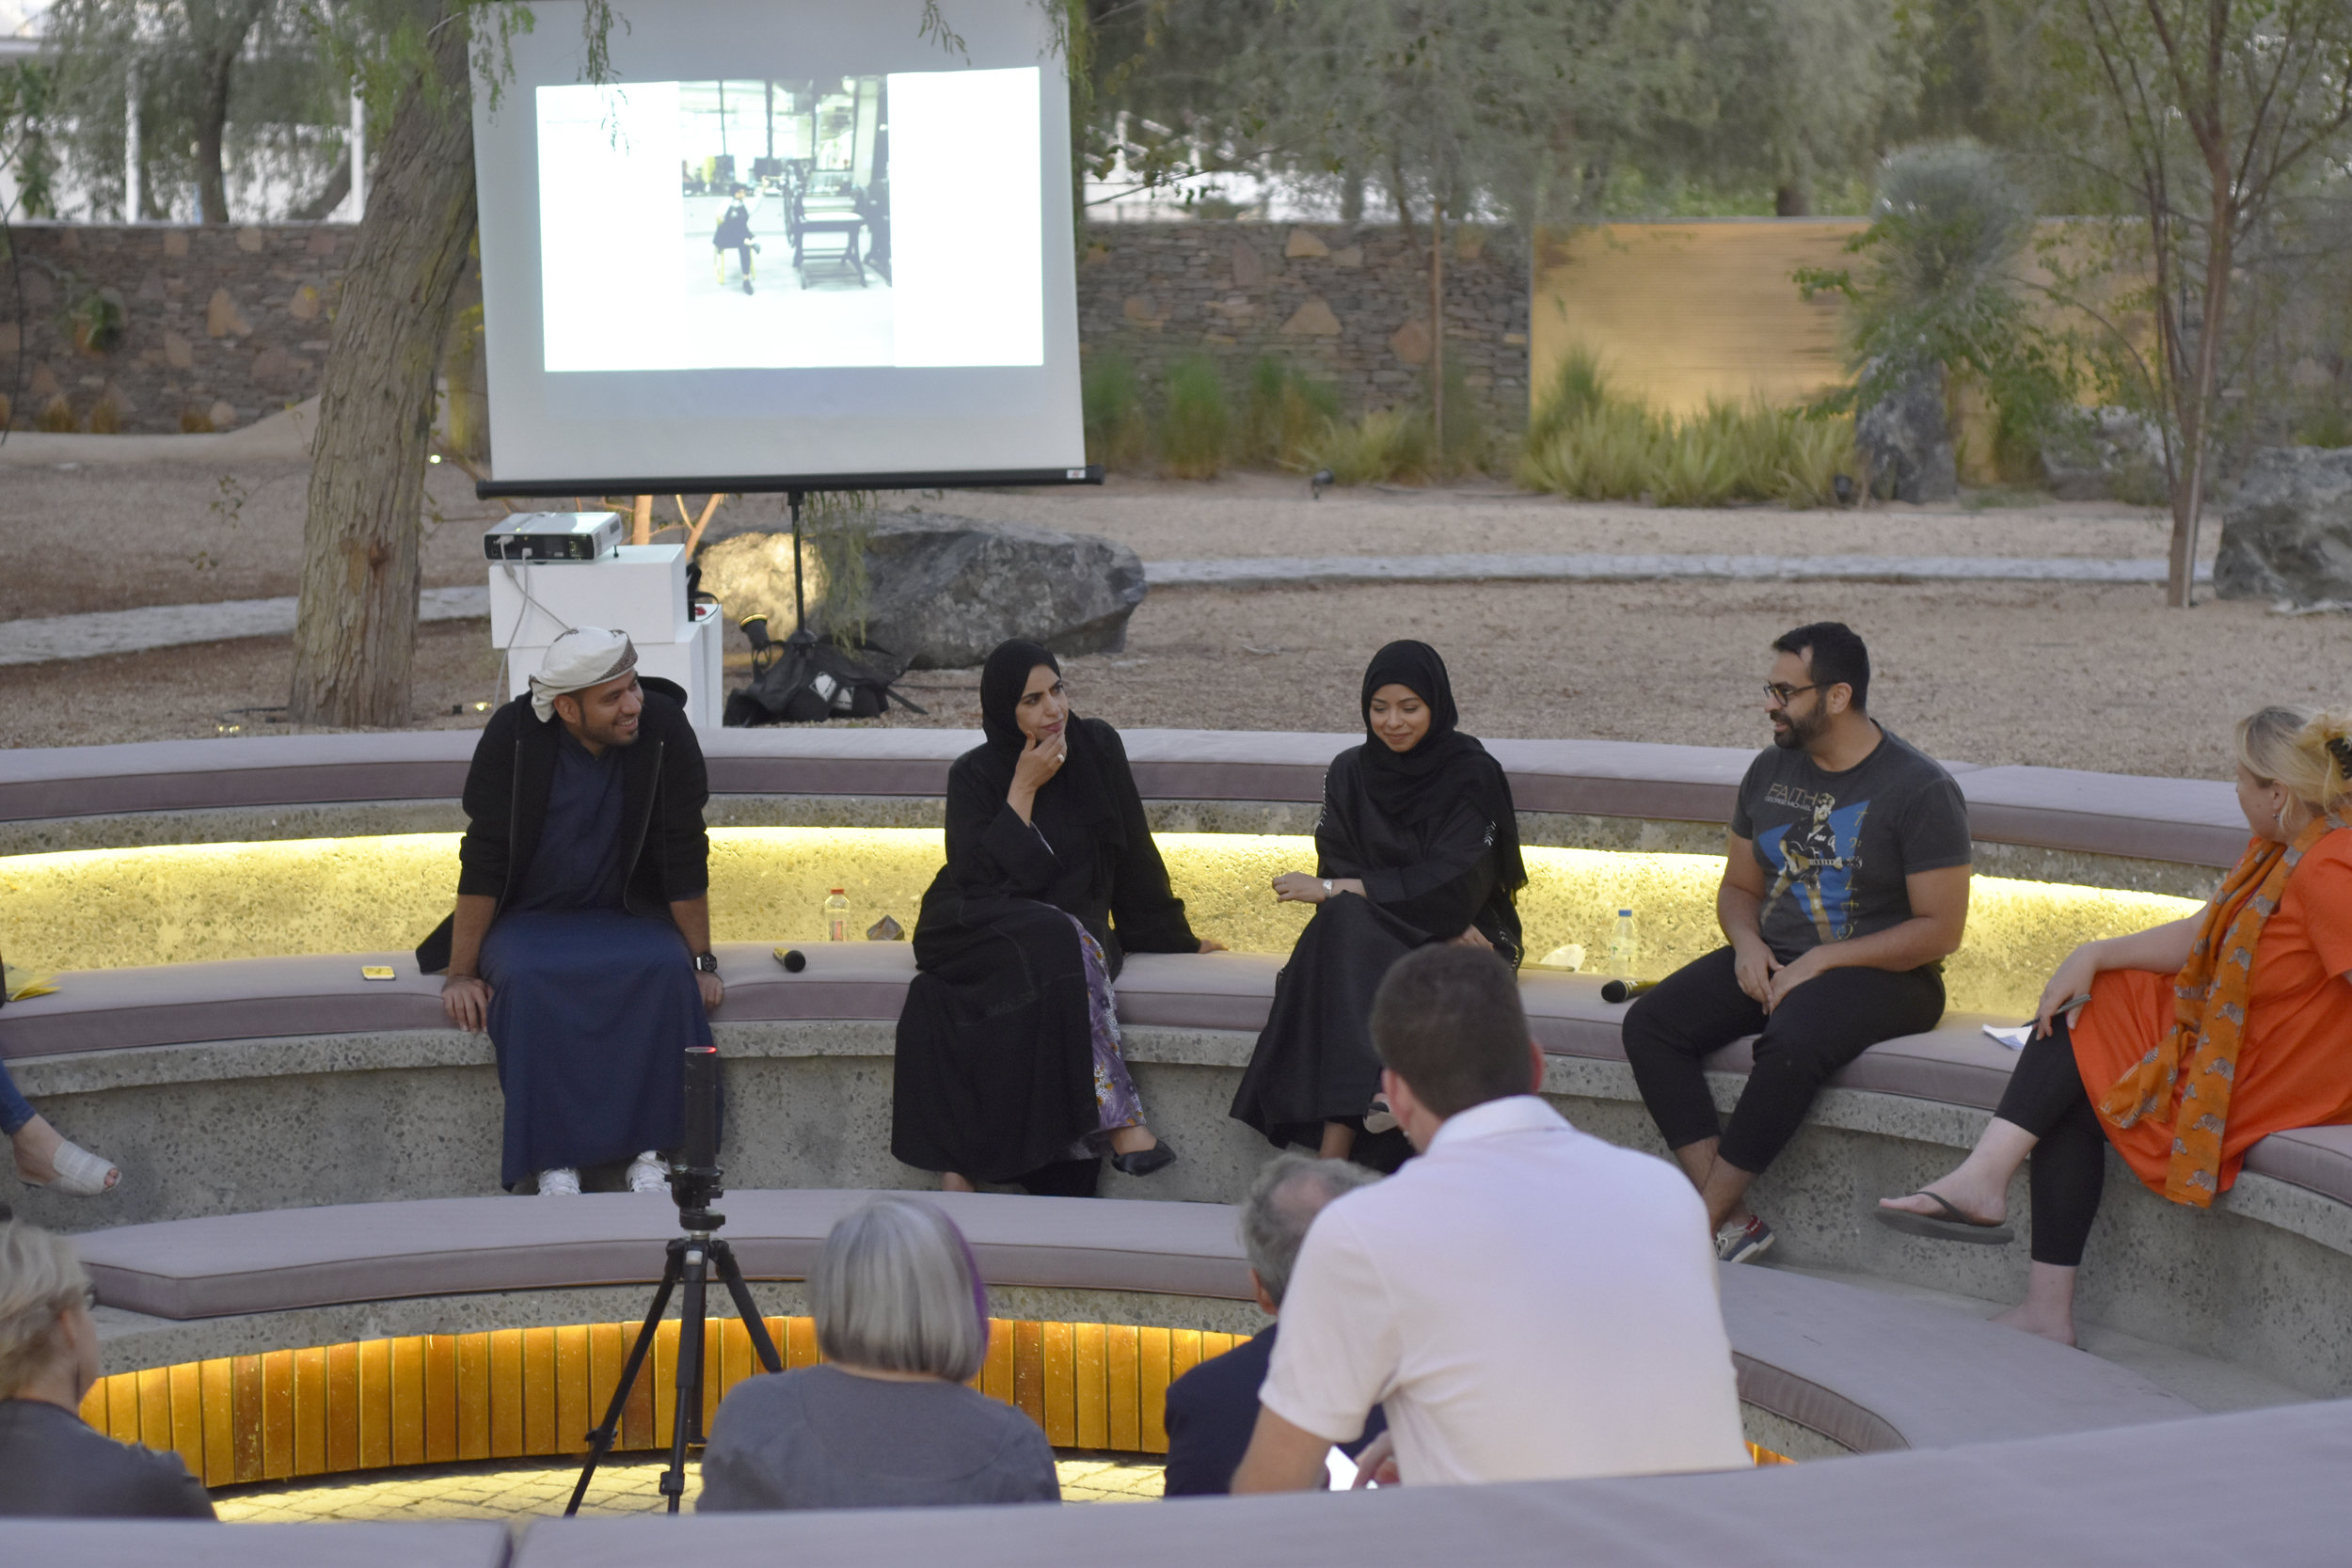 Tashkeel Talk with Saeed Al Madani, Dr. Karima Al Shomaly, Salama Nasib, Khalid Mezaina and moderator Lisa Ball-Lechgar. Image courtesy of Tashkeel.jpg